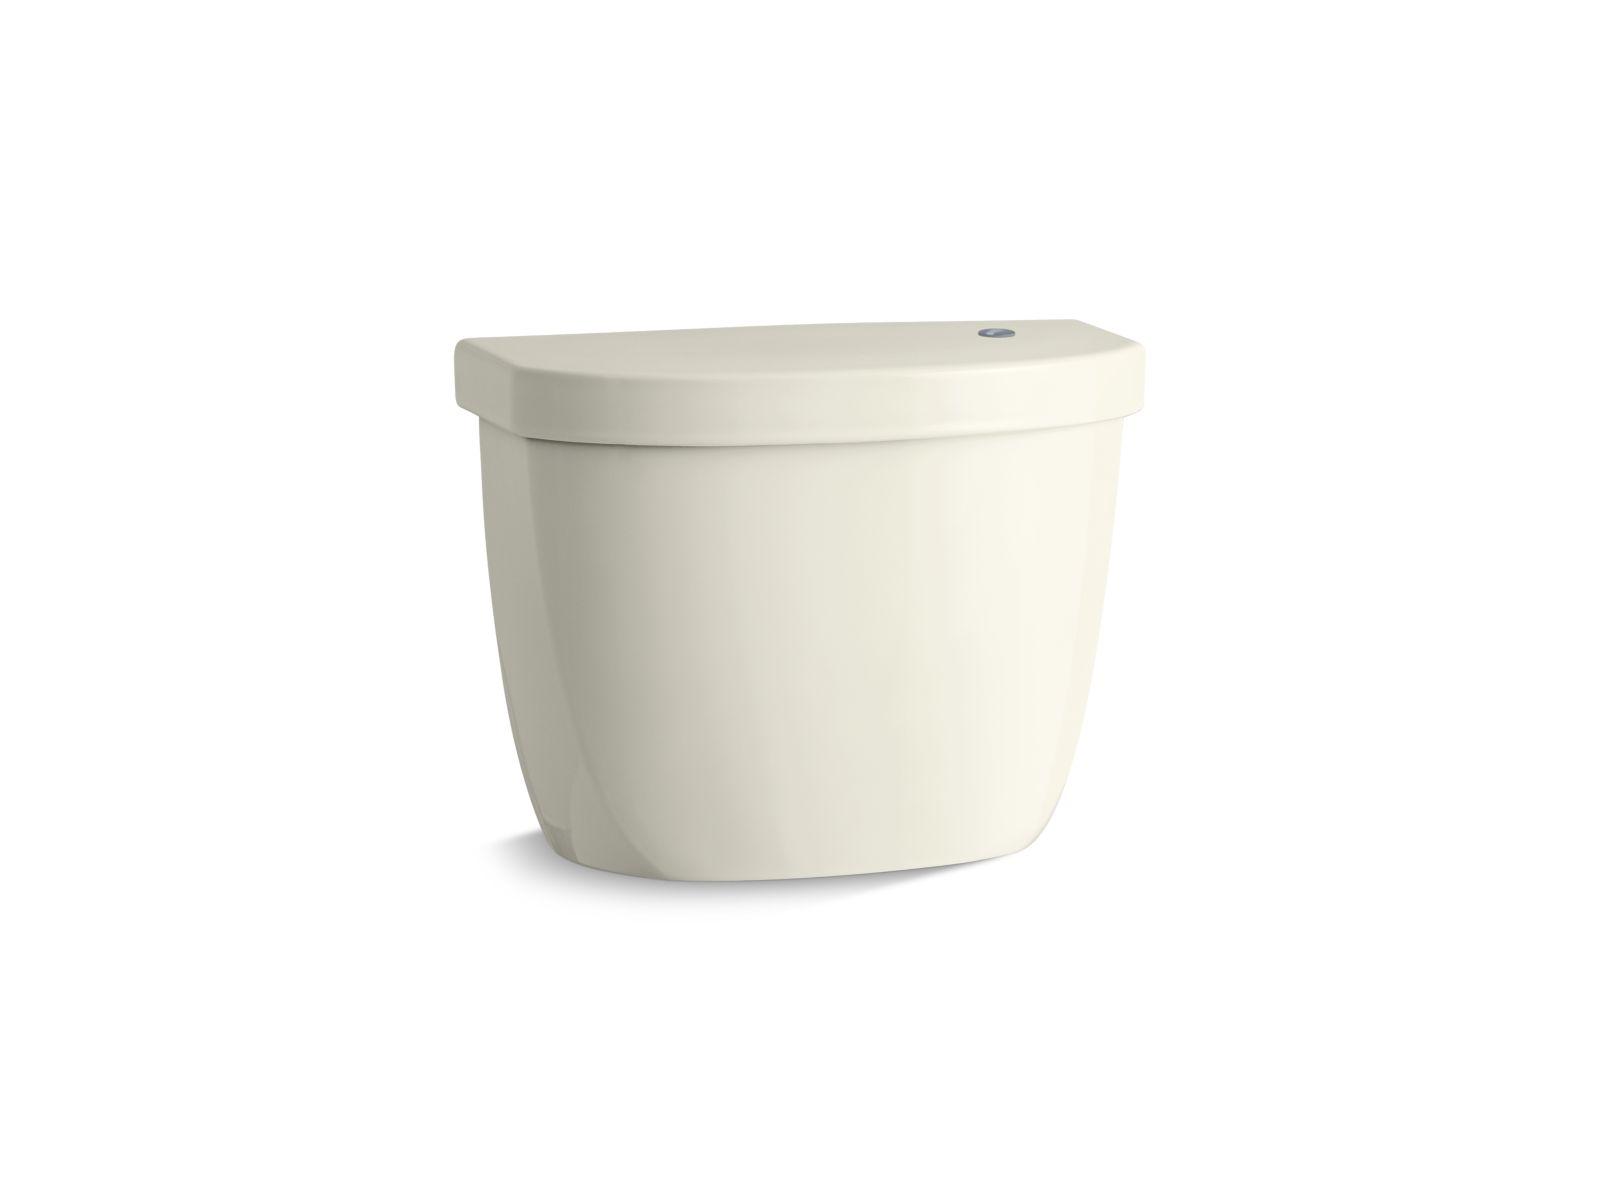 Kohler Cimarron® K-5693-96 tank for K-6419 round-front touchless toilet Biscuit